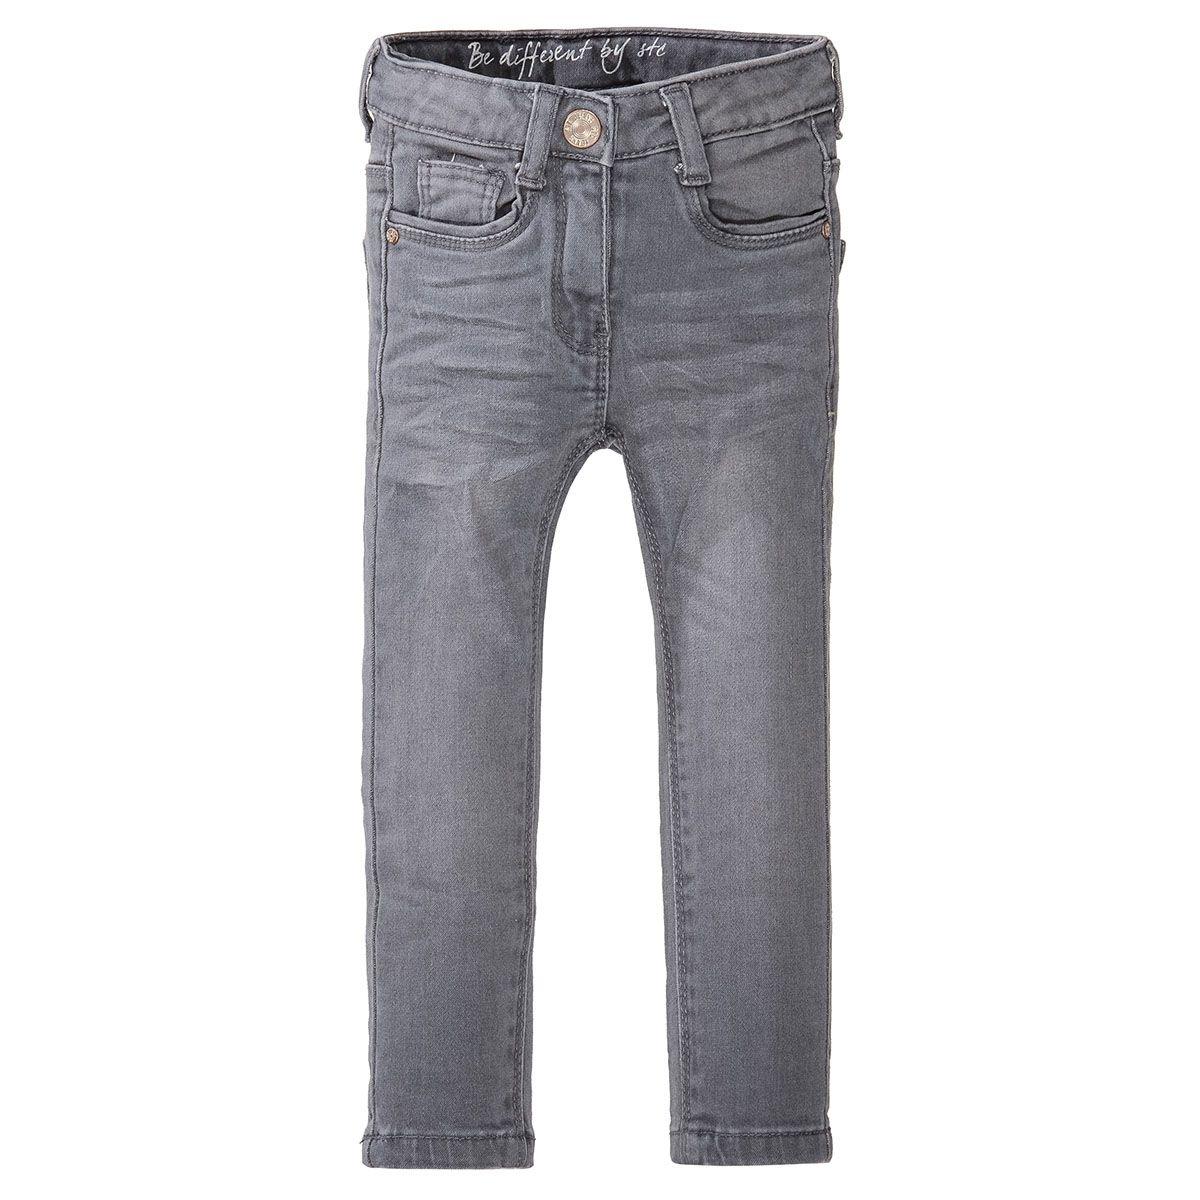 Mädchen Skinny Jeans Slim Fit - Grey Denim